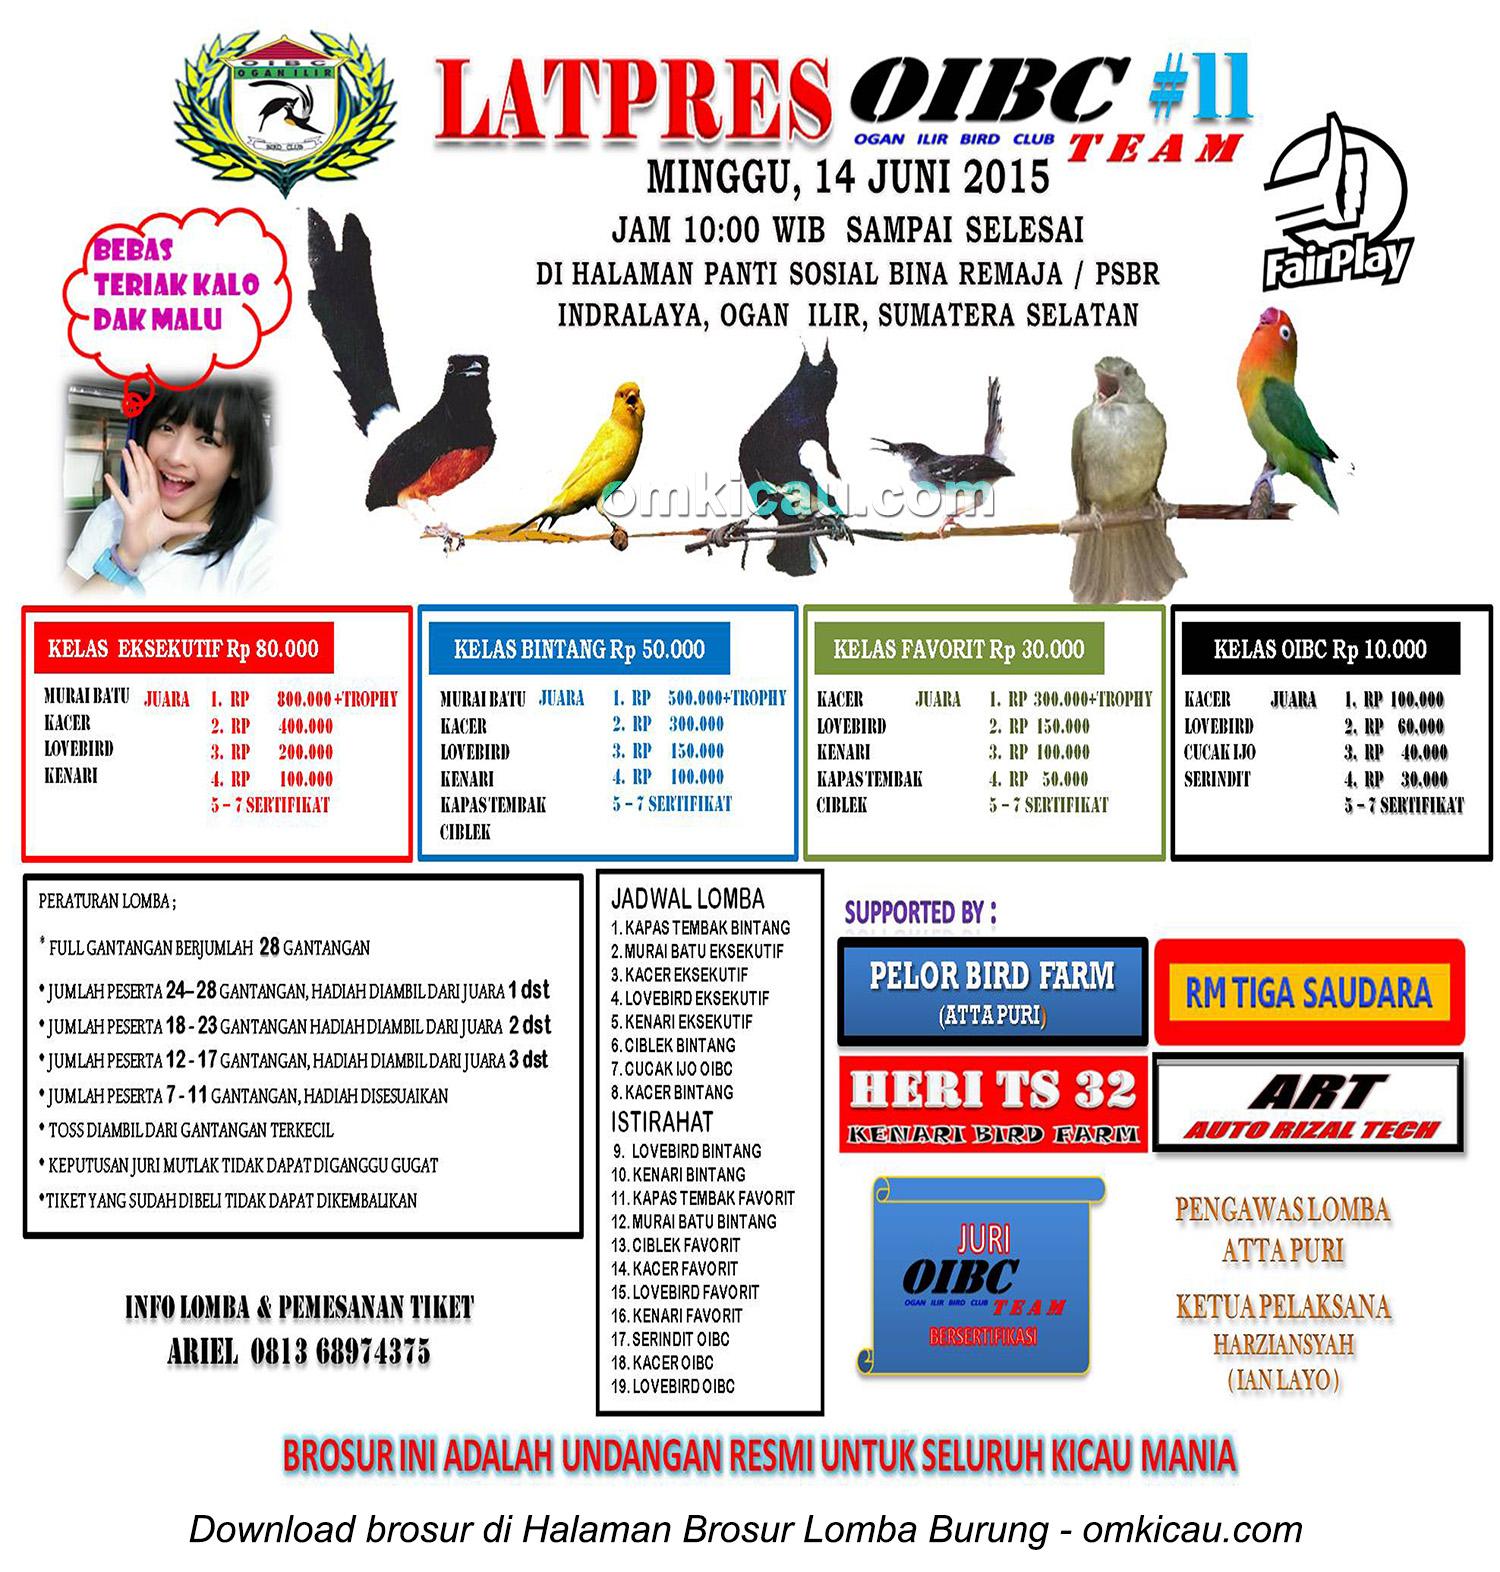 Brosur Latpres Burung Berkicau OIBC #11, Ogan Ilir, 14 Juni 2015